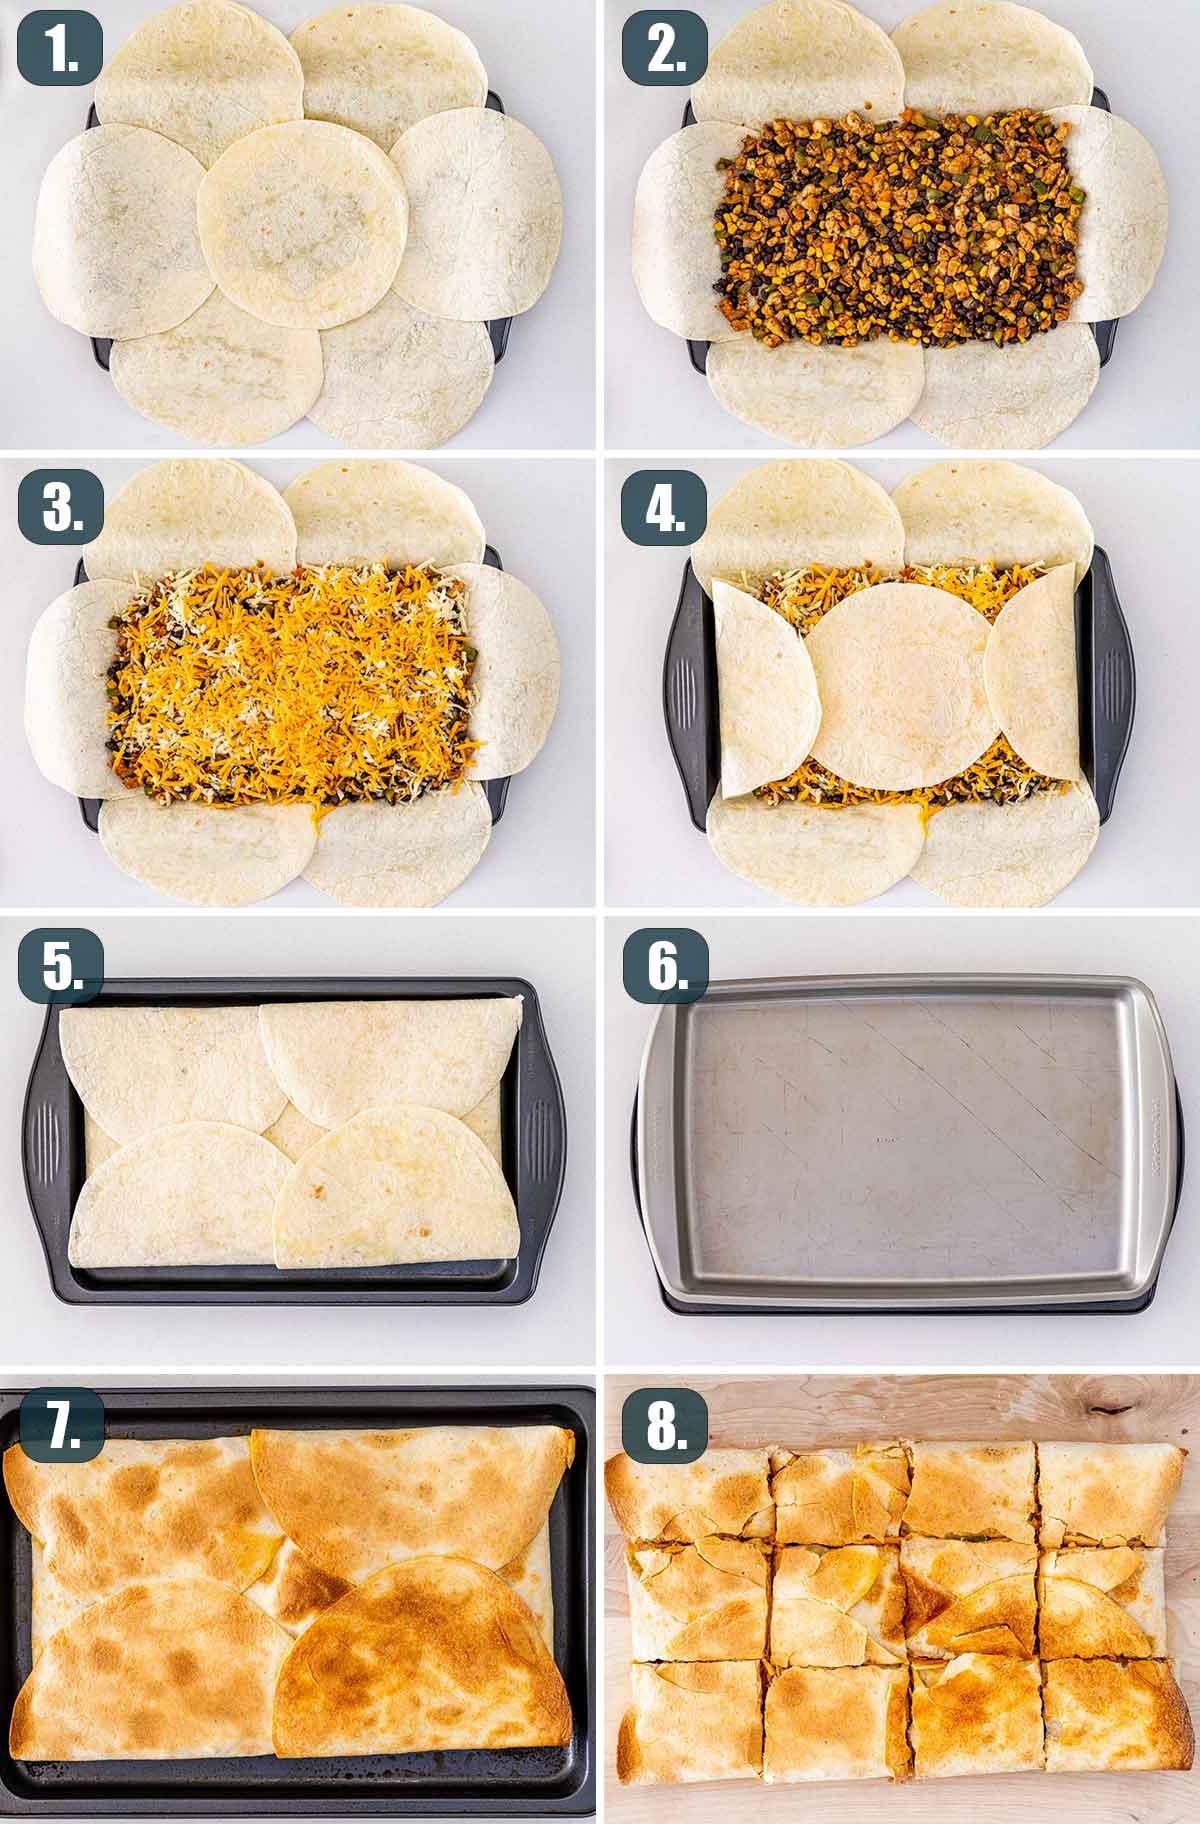 detail process shots showing how to assemble sheet pan quesadilla.